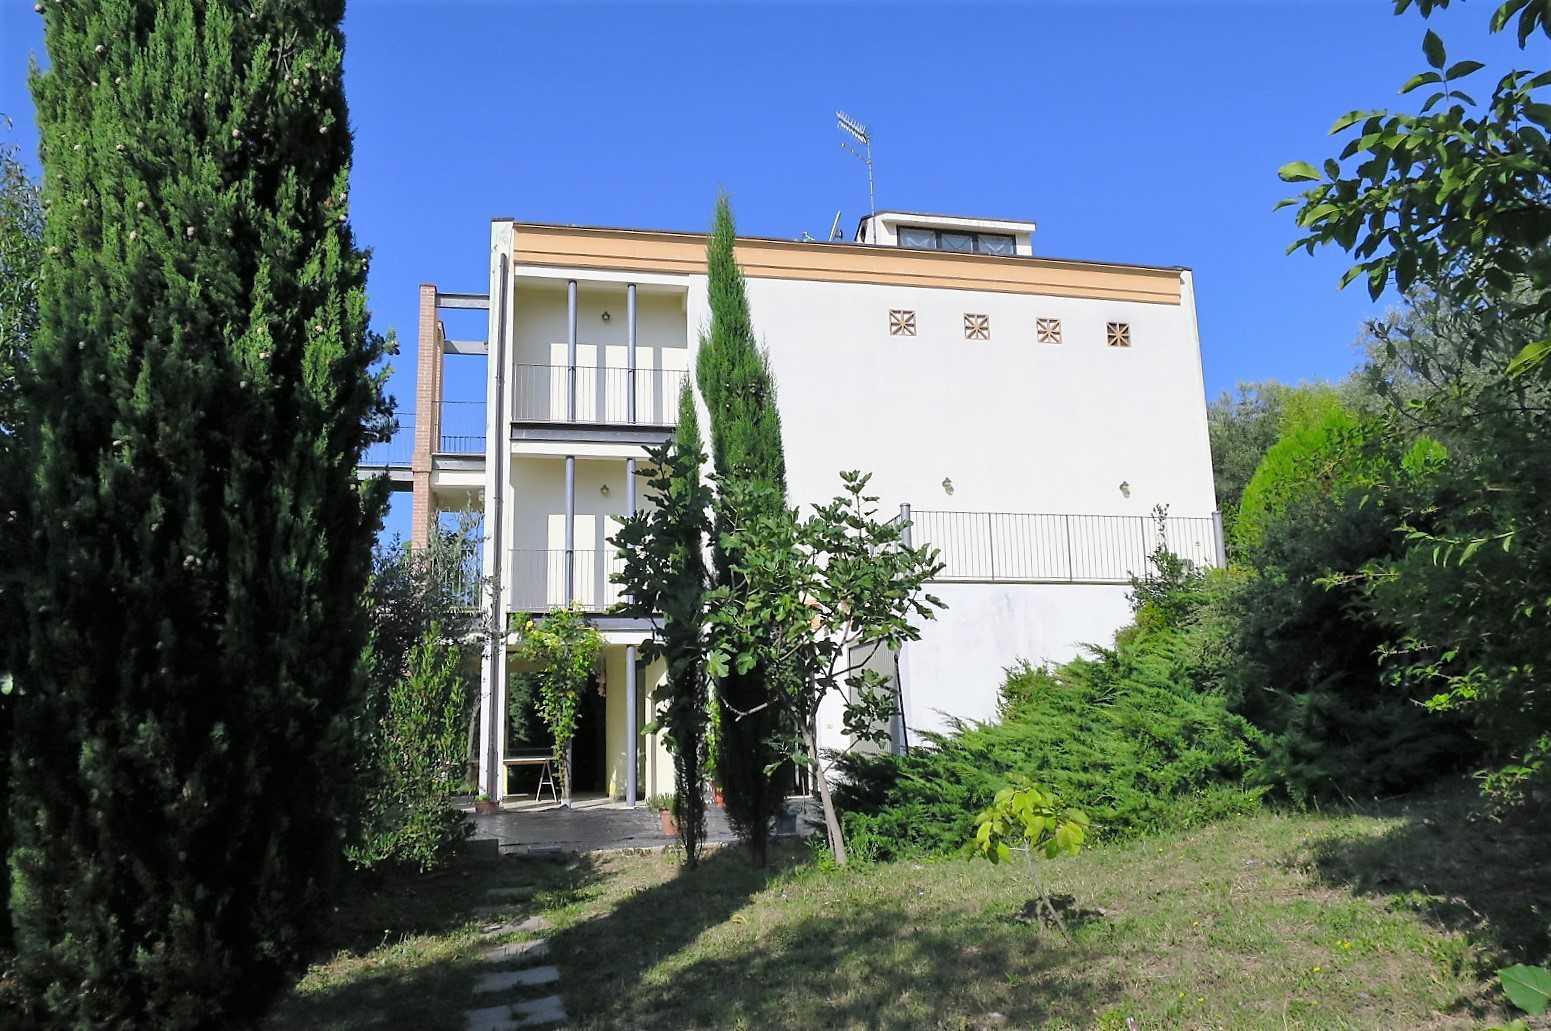 Villa Villa in vendita Atri (TE), Villa Paola - Atri - EUR 471.071 10